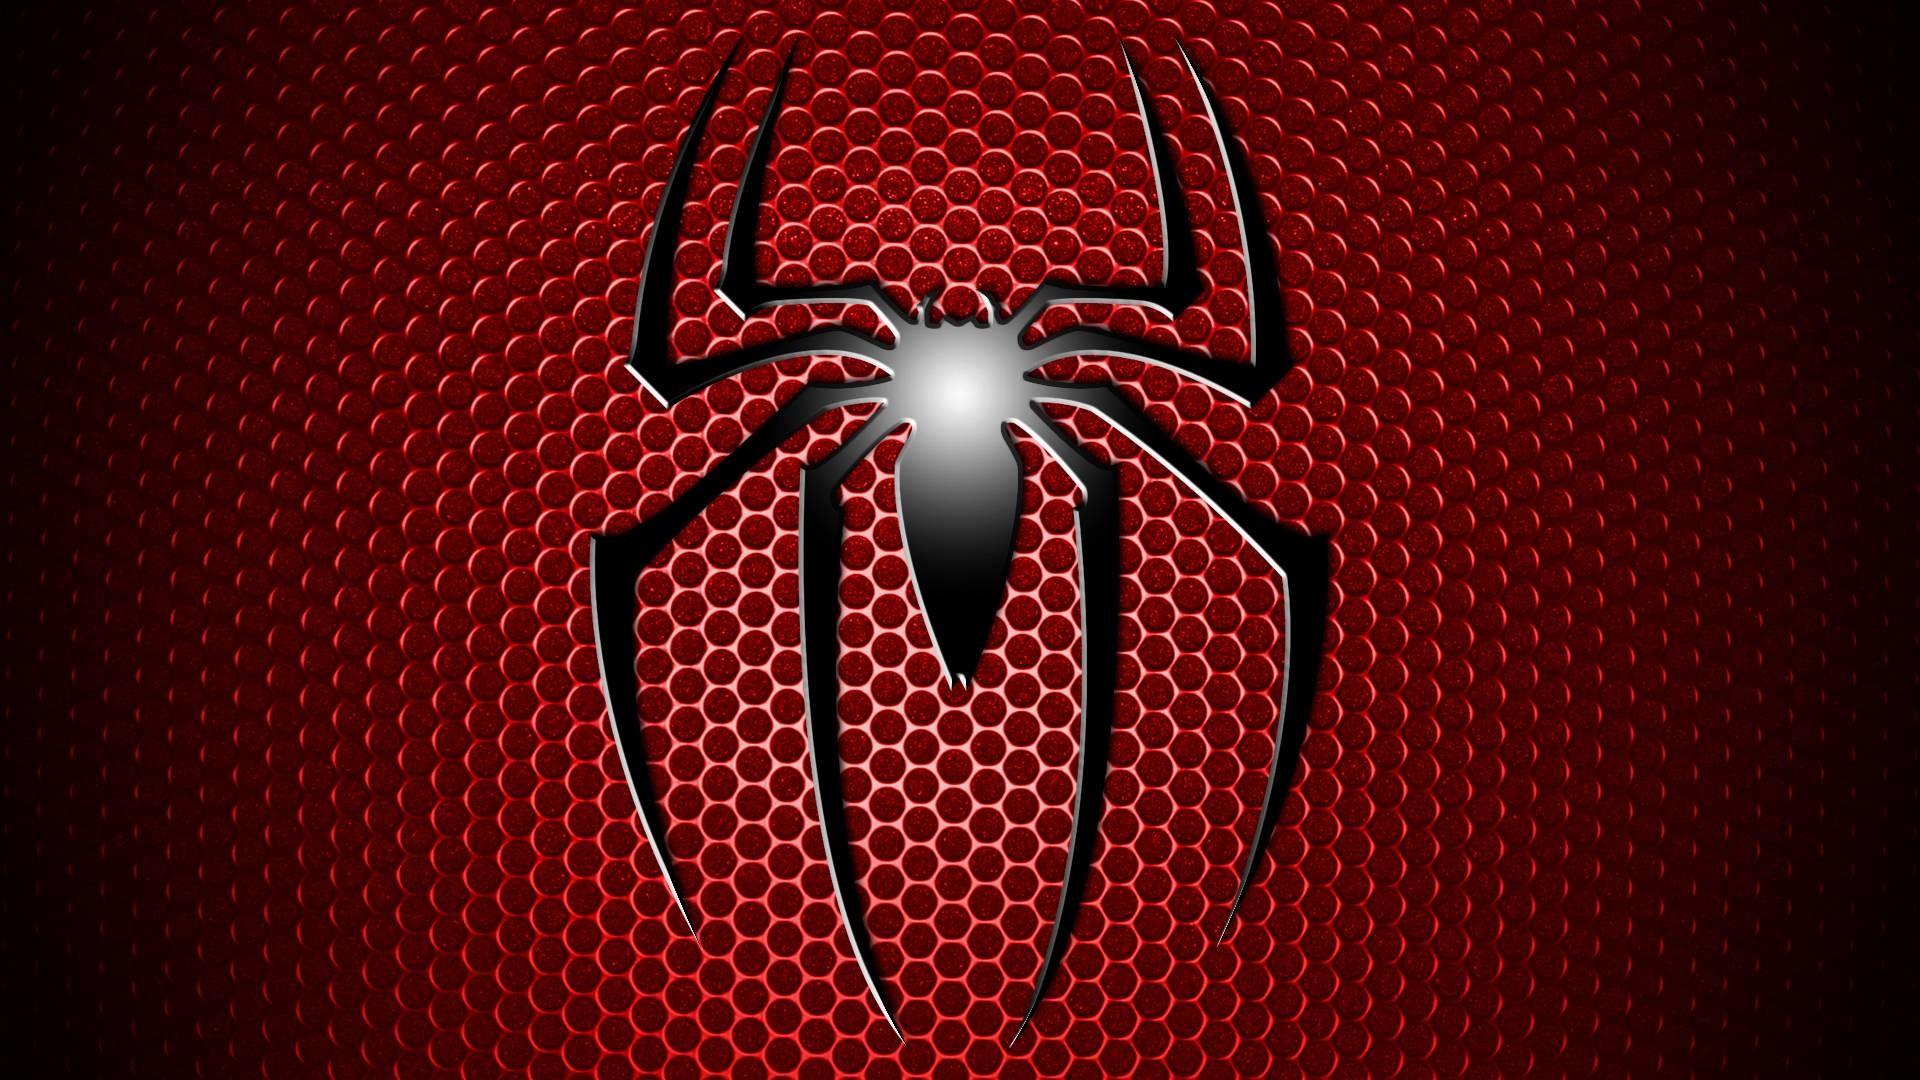 Wallpapers For > Spiderman Logo Wallpaper